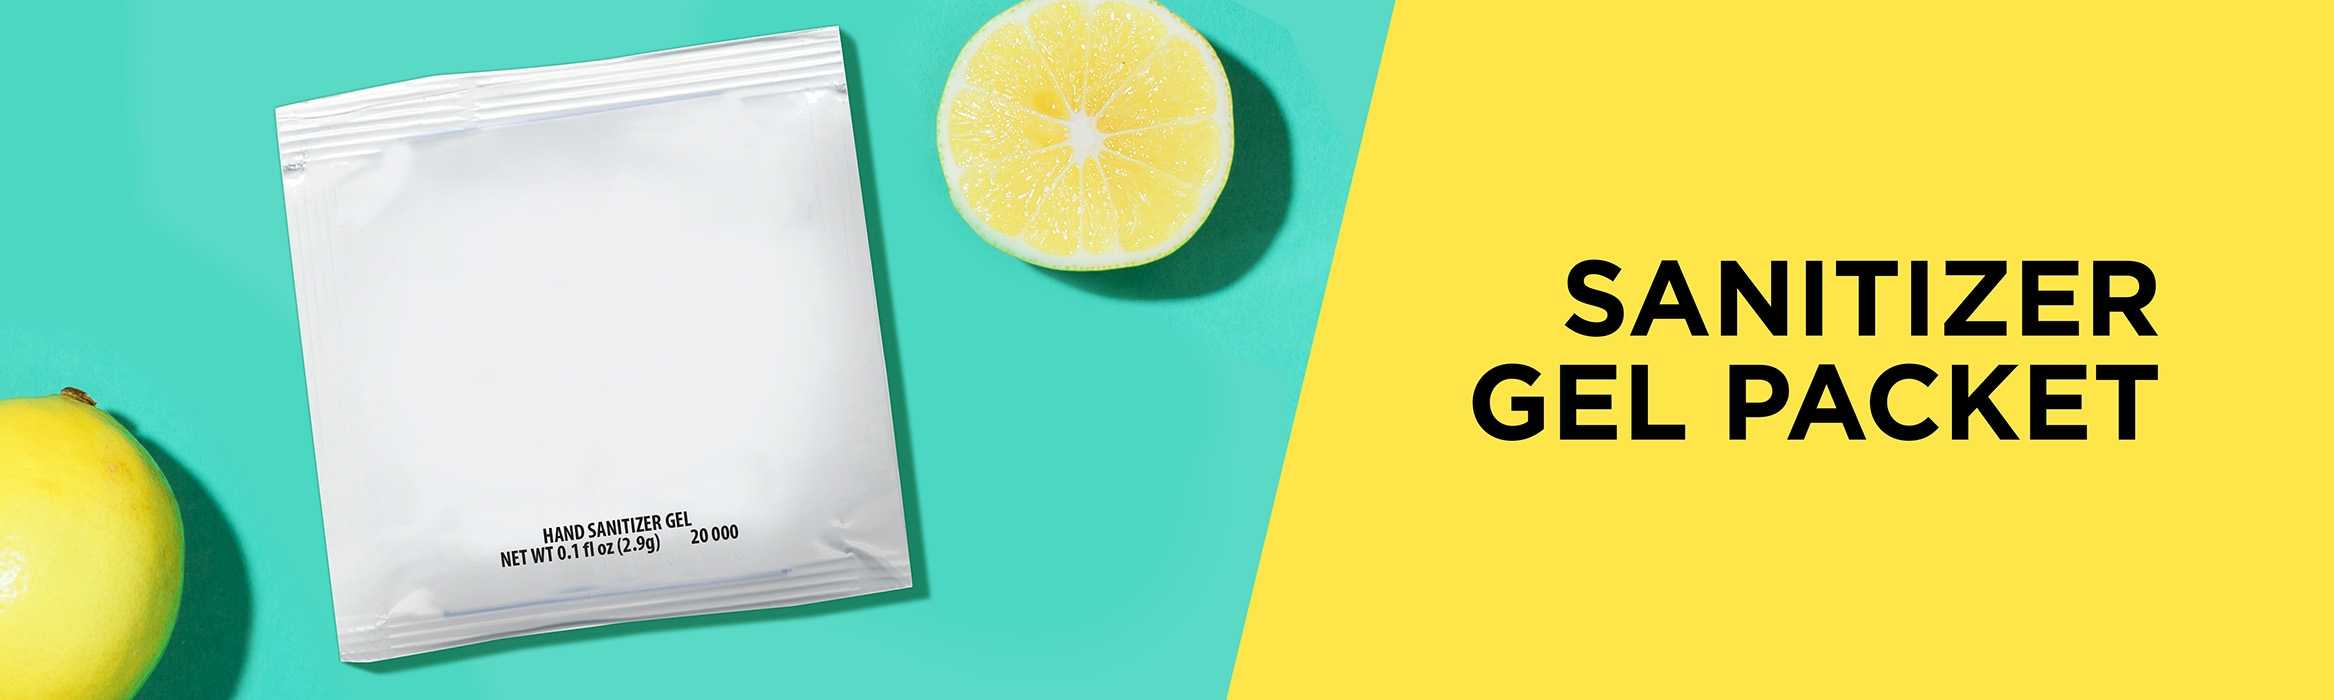 Sanitizer Gel Packet AIM